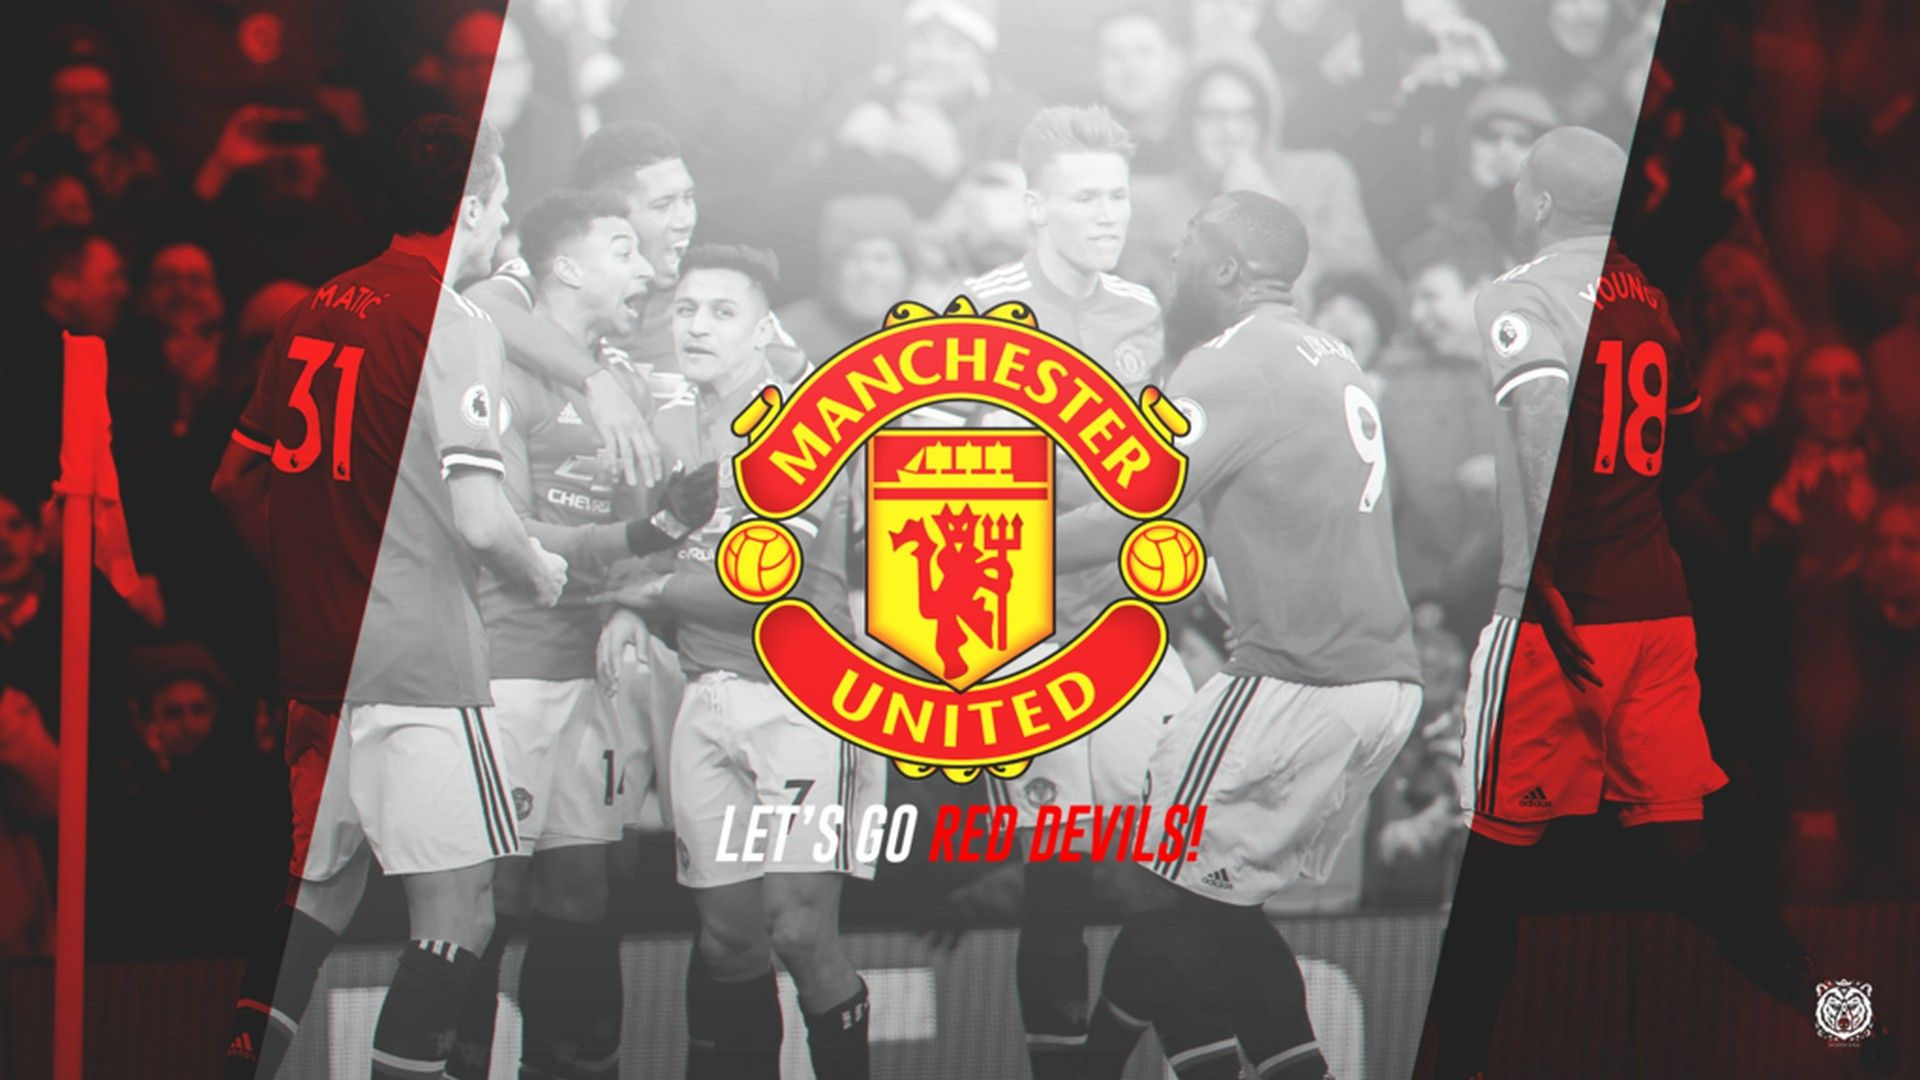 Manchester United Desktop Wallpapers - Wallpaper Cave